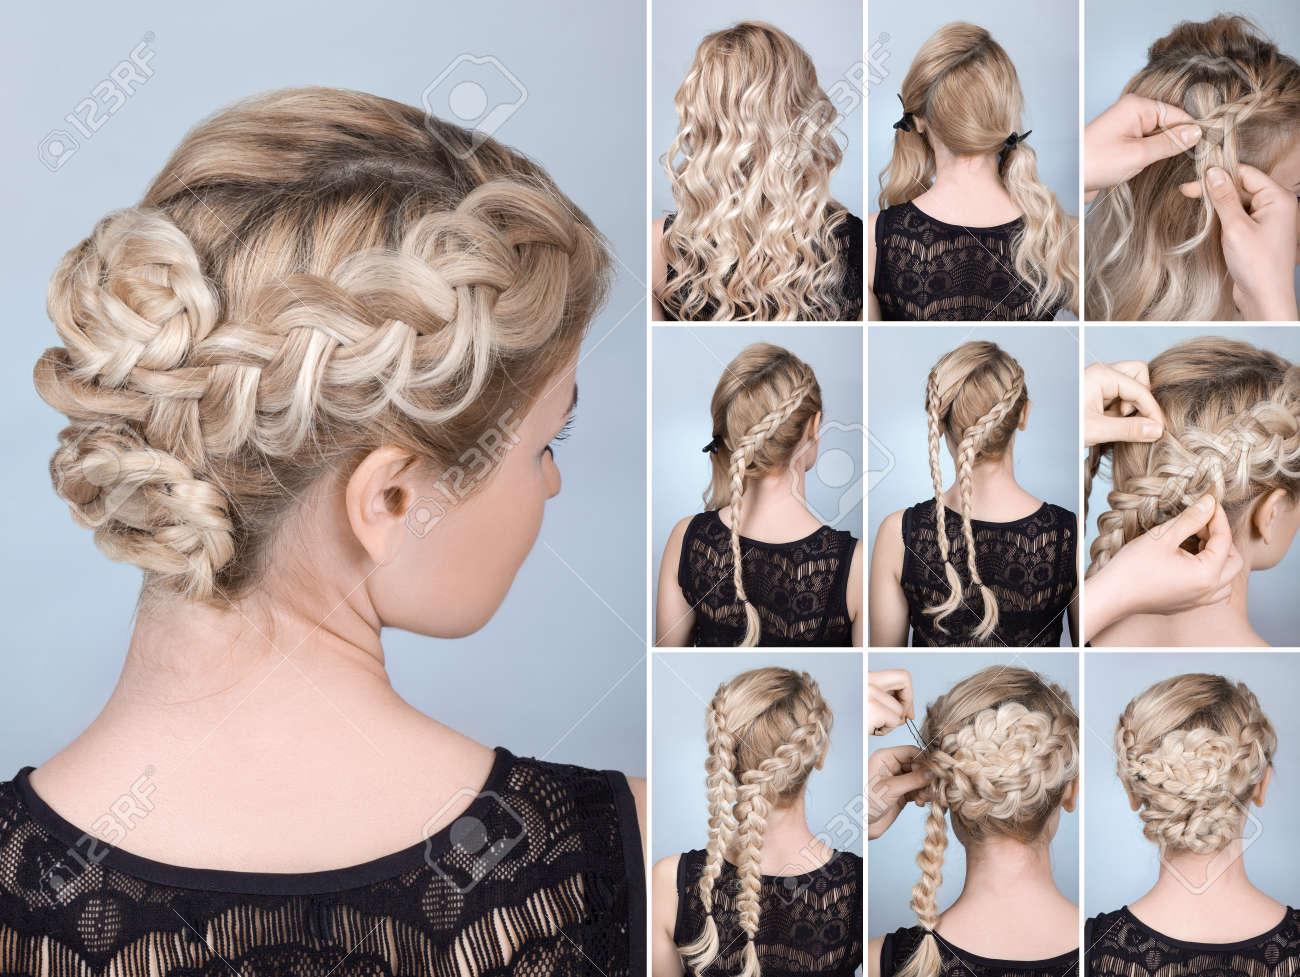 hairstyle braid on blonde model tutorial. Hairdo for long hair - 58146069